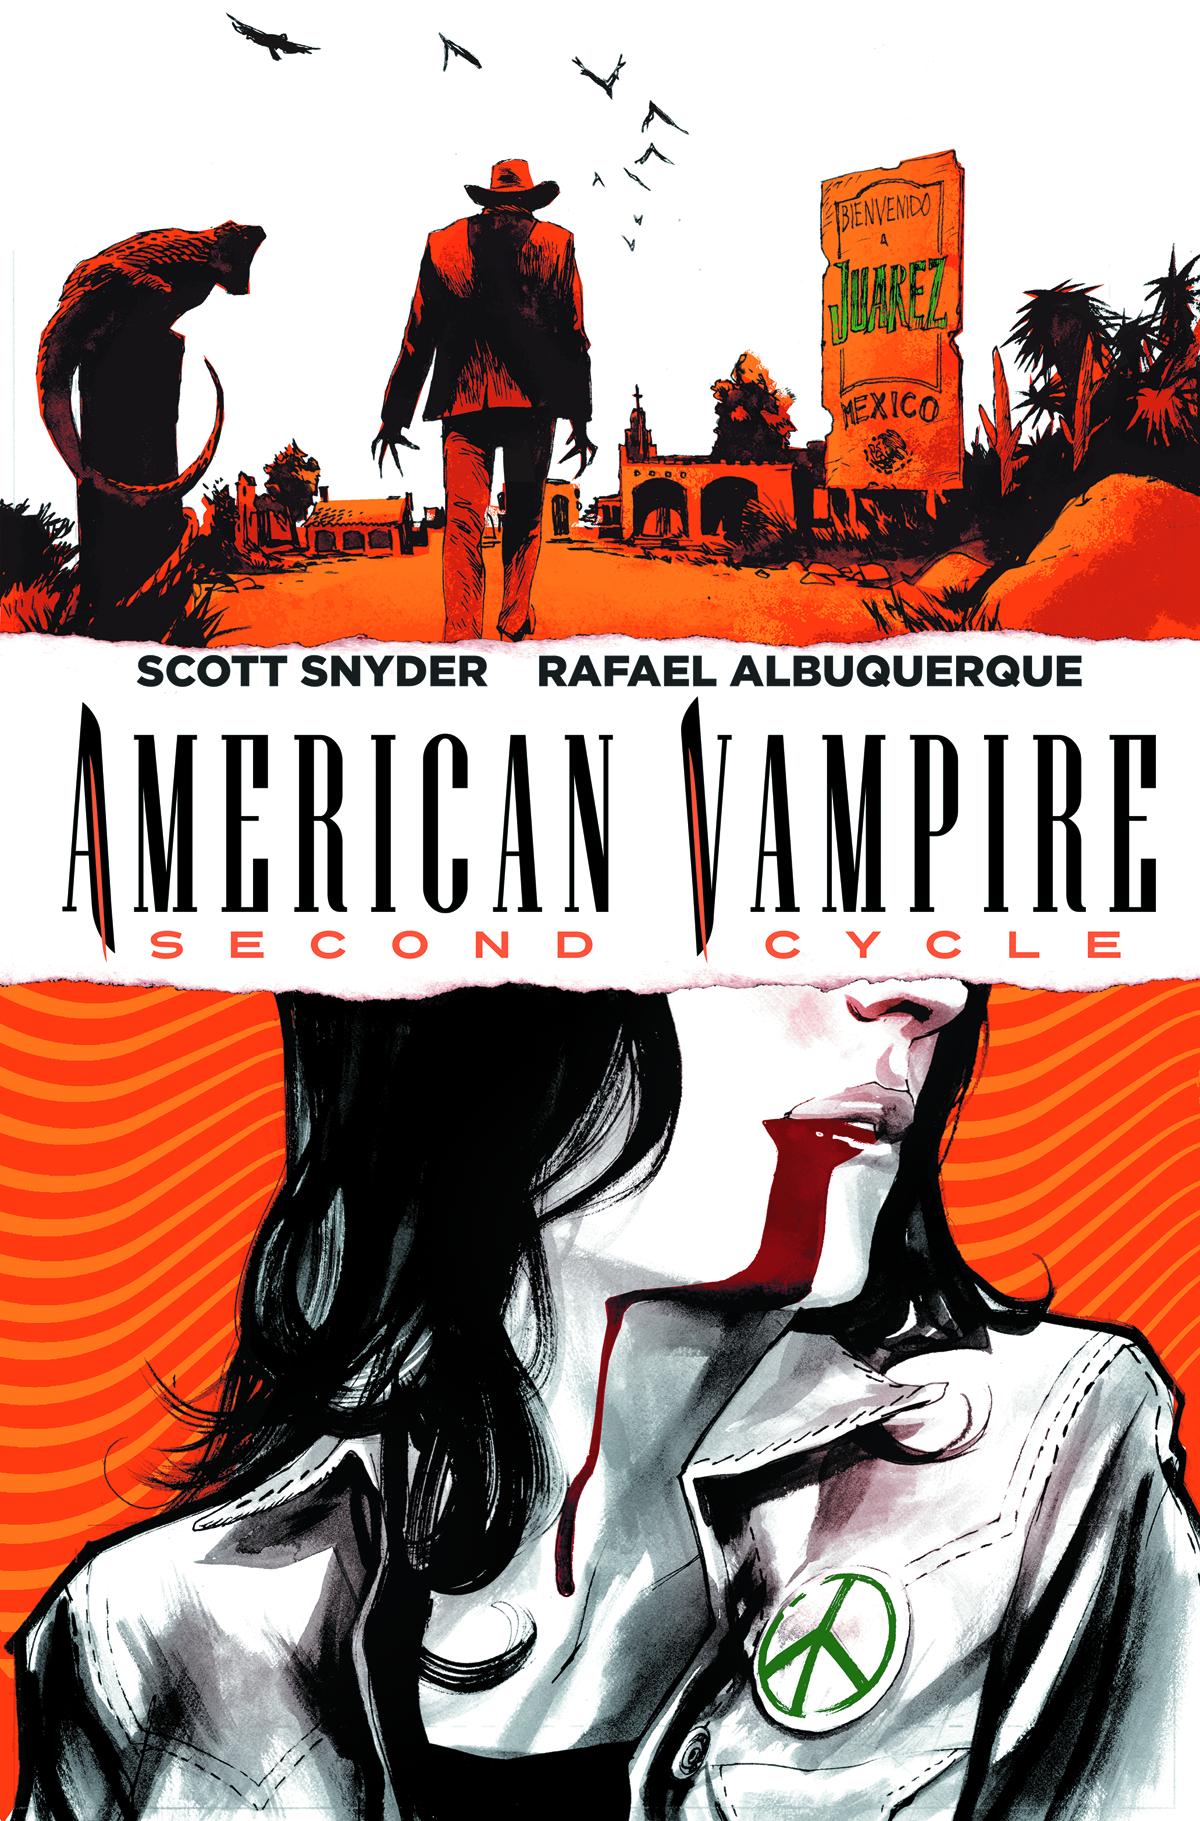 AMERICAN VAMPIRE SECOND CYCLE #1 (MR) (JAN140366)